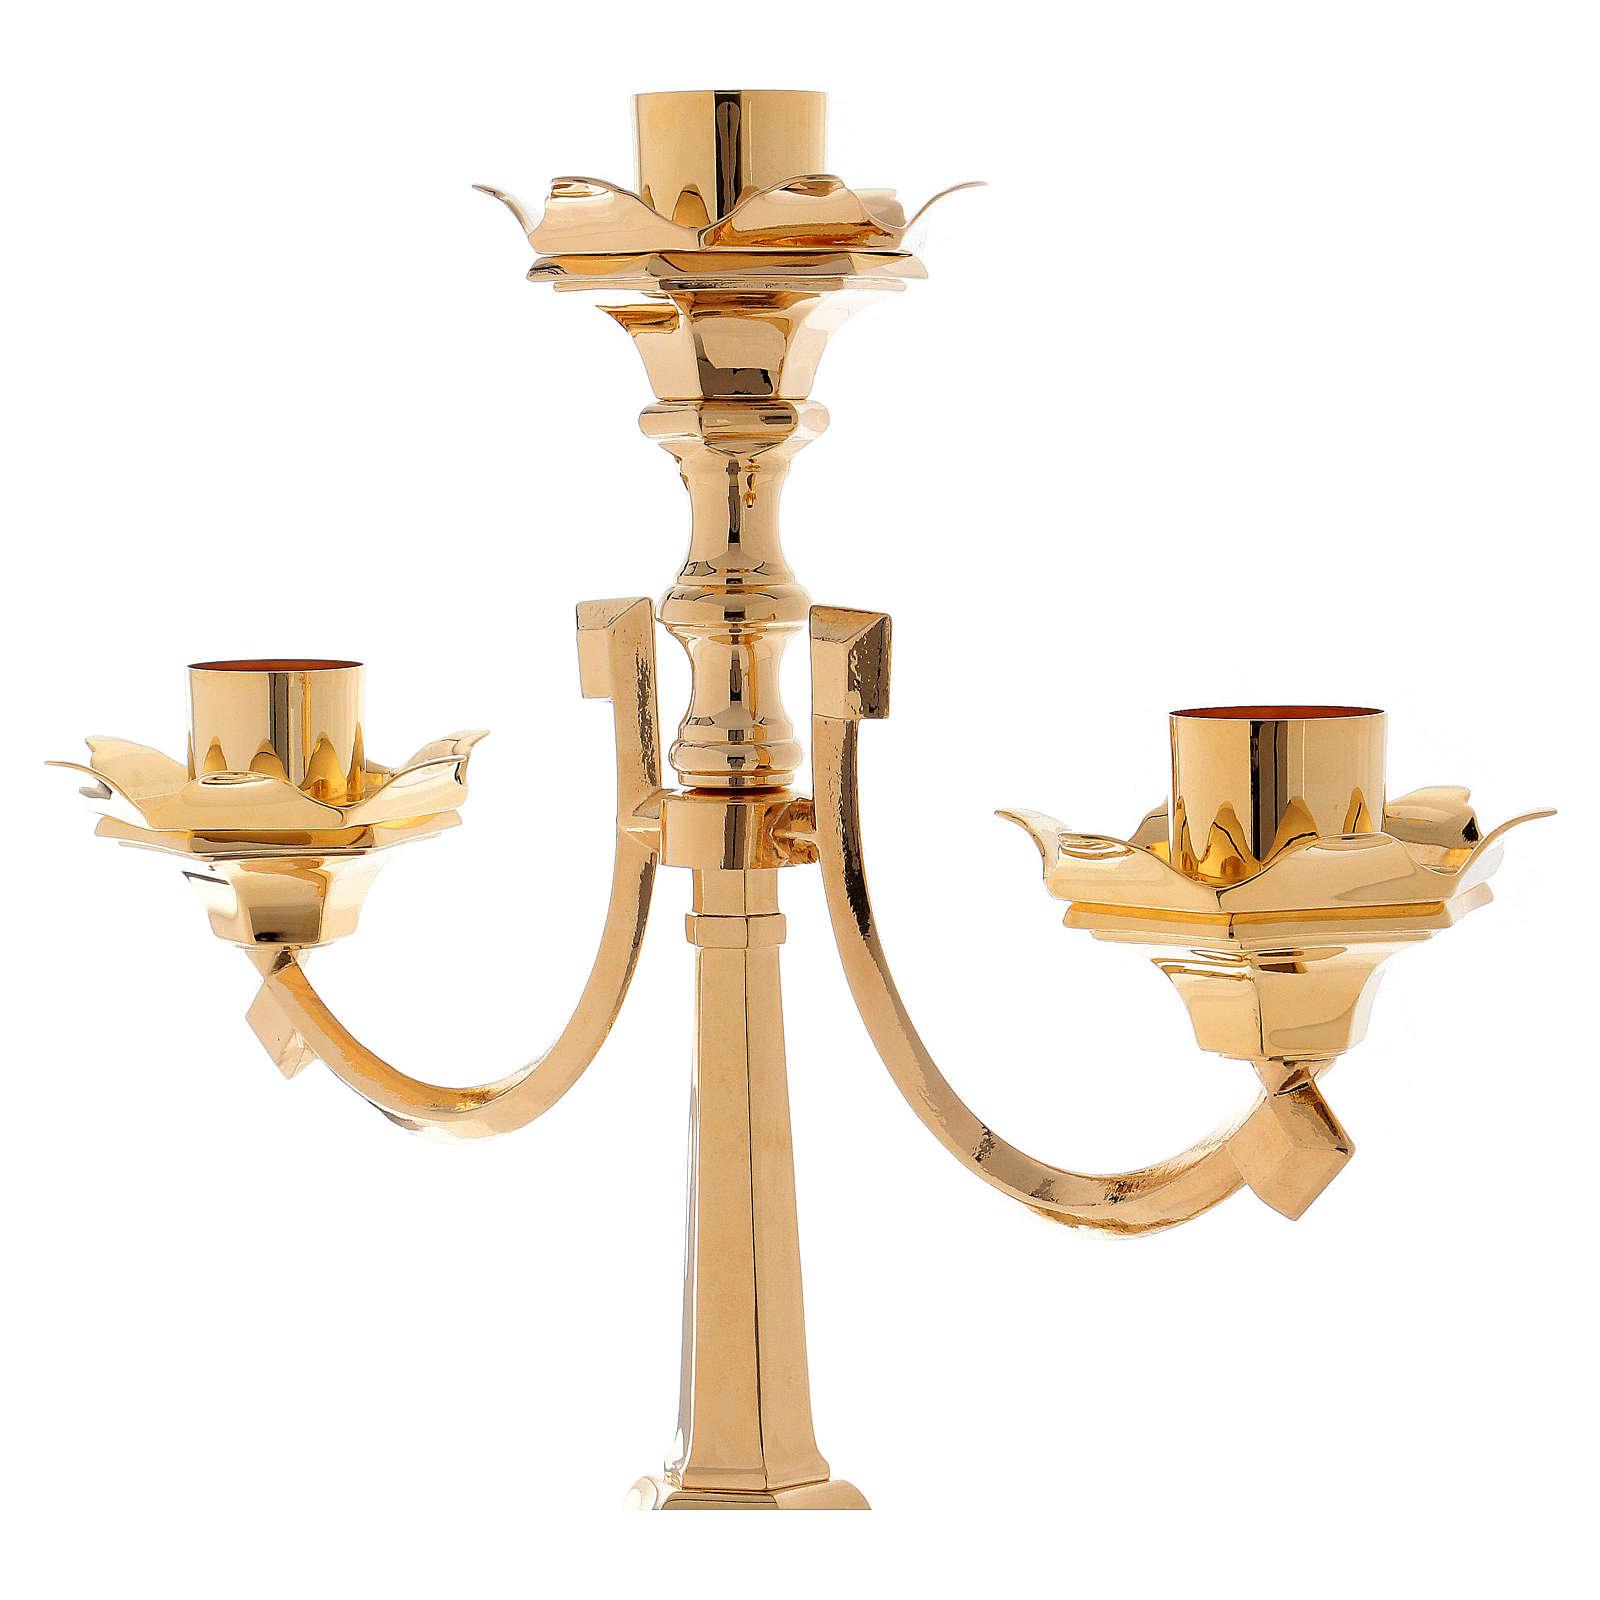 Kerzenleuchter 3 flammen Barock Stil 100cm Messing 4